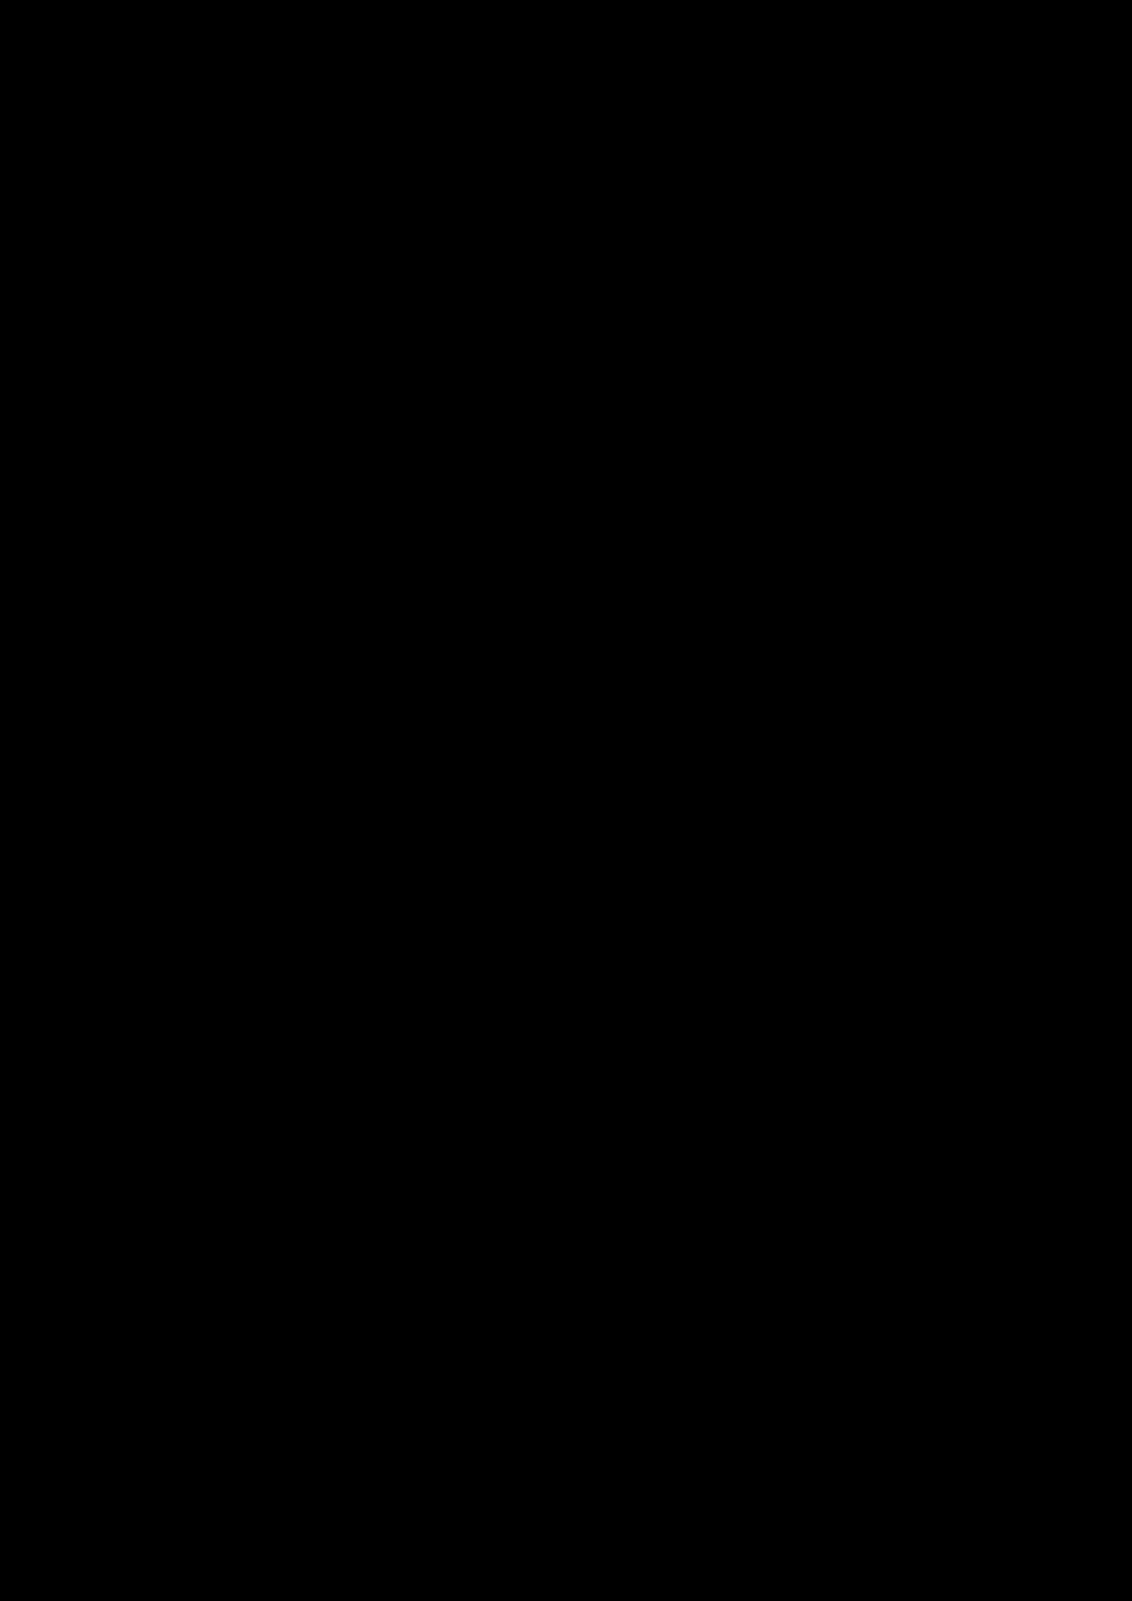 Belyiy sokol slide, Image 65